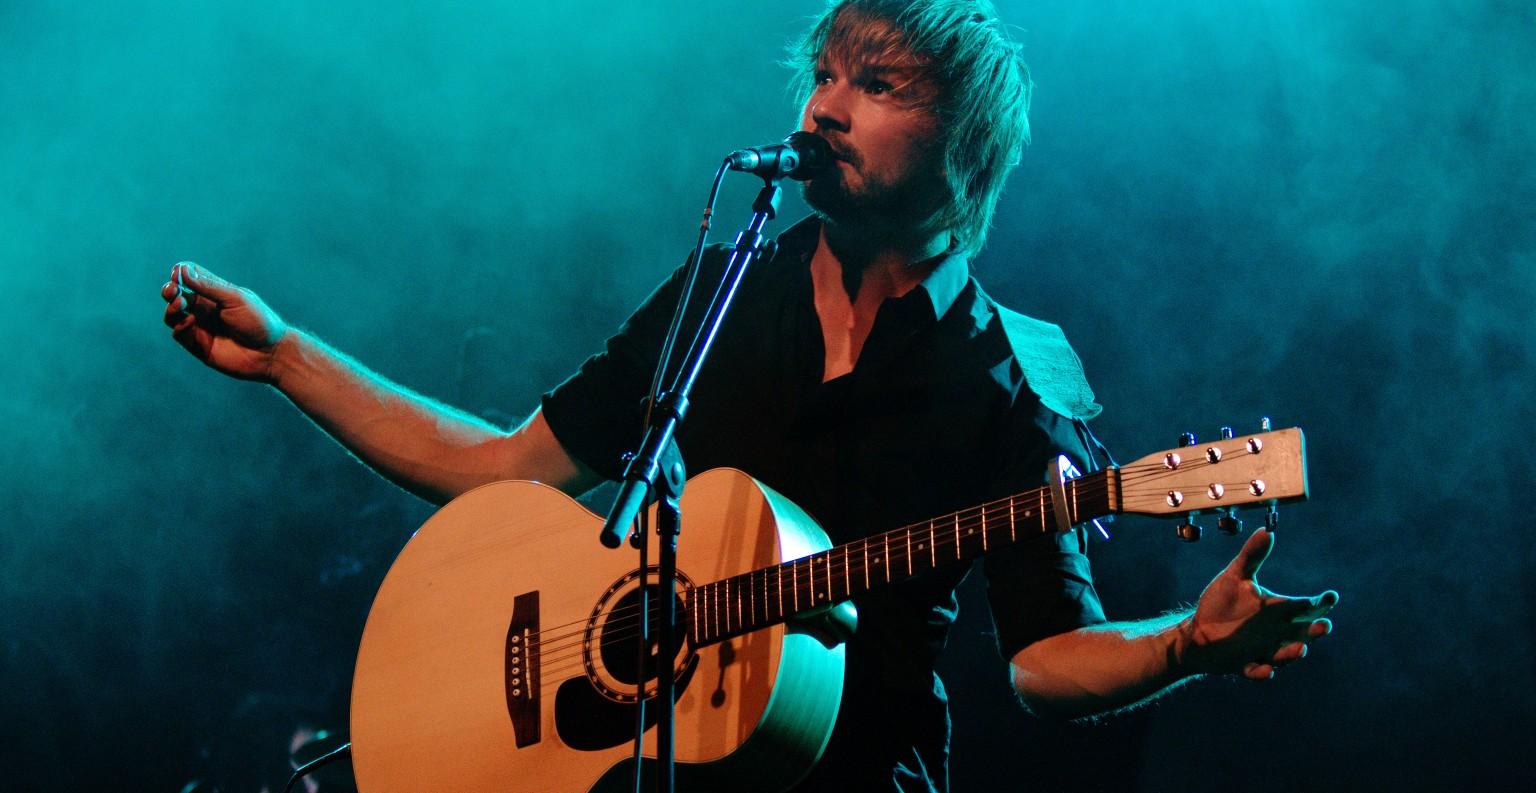 Nicolas Pantalacci, alias Monsieur Lune, en concert. ©E.Joly